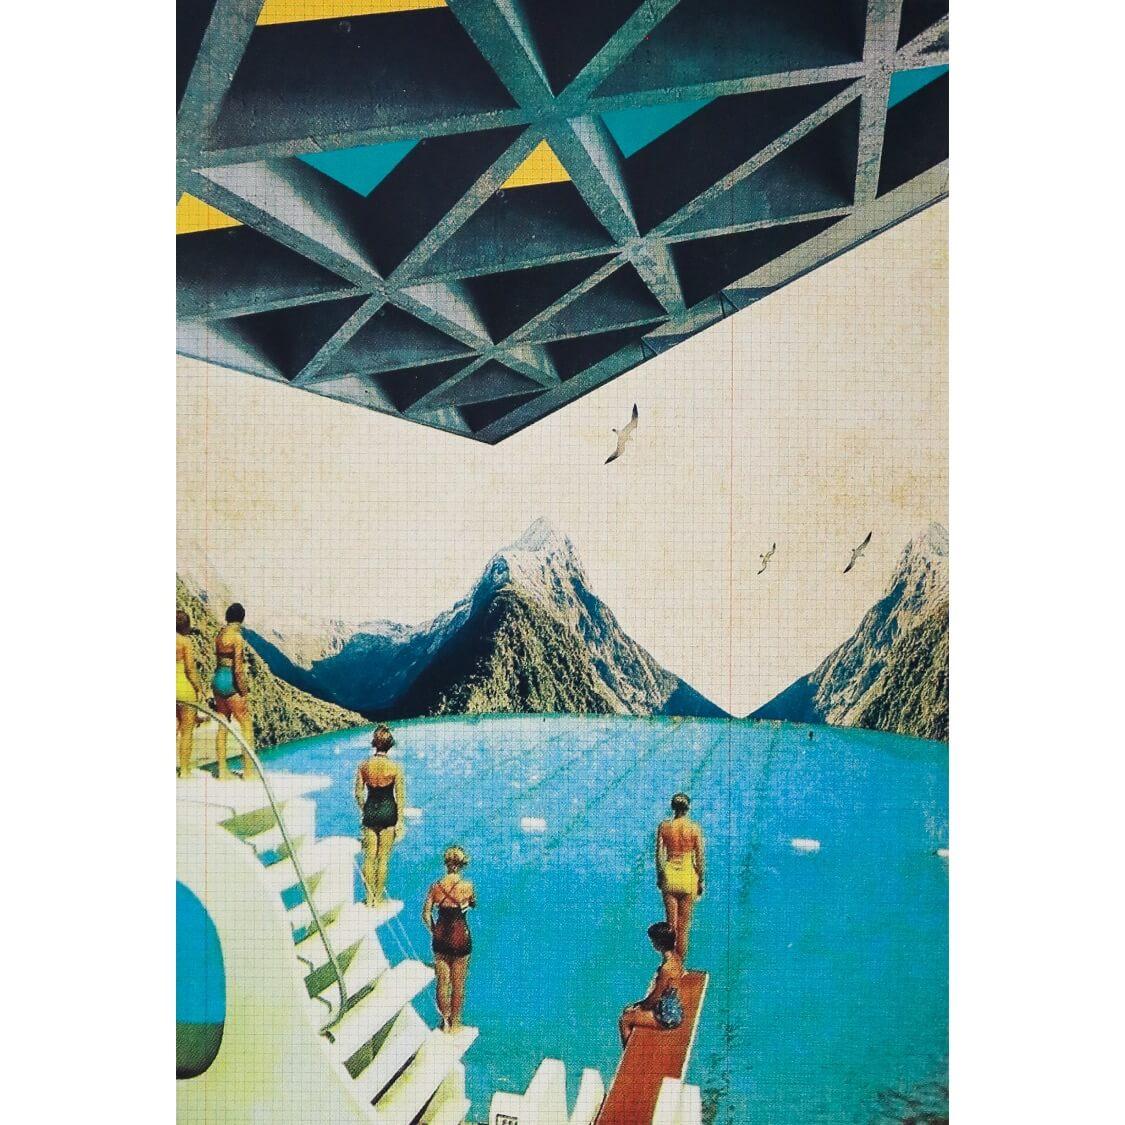 C11D7AD5 86DB 4302 8EAA C4CF9F4C1052 - Utopian Swim by Maxine Gregson